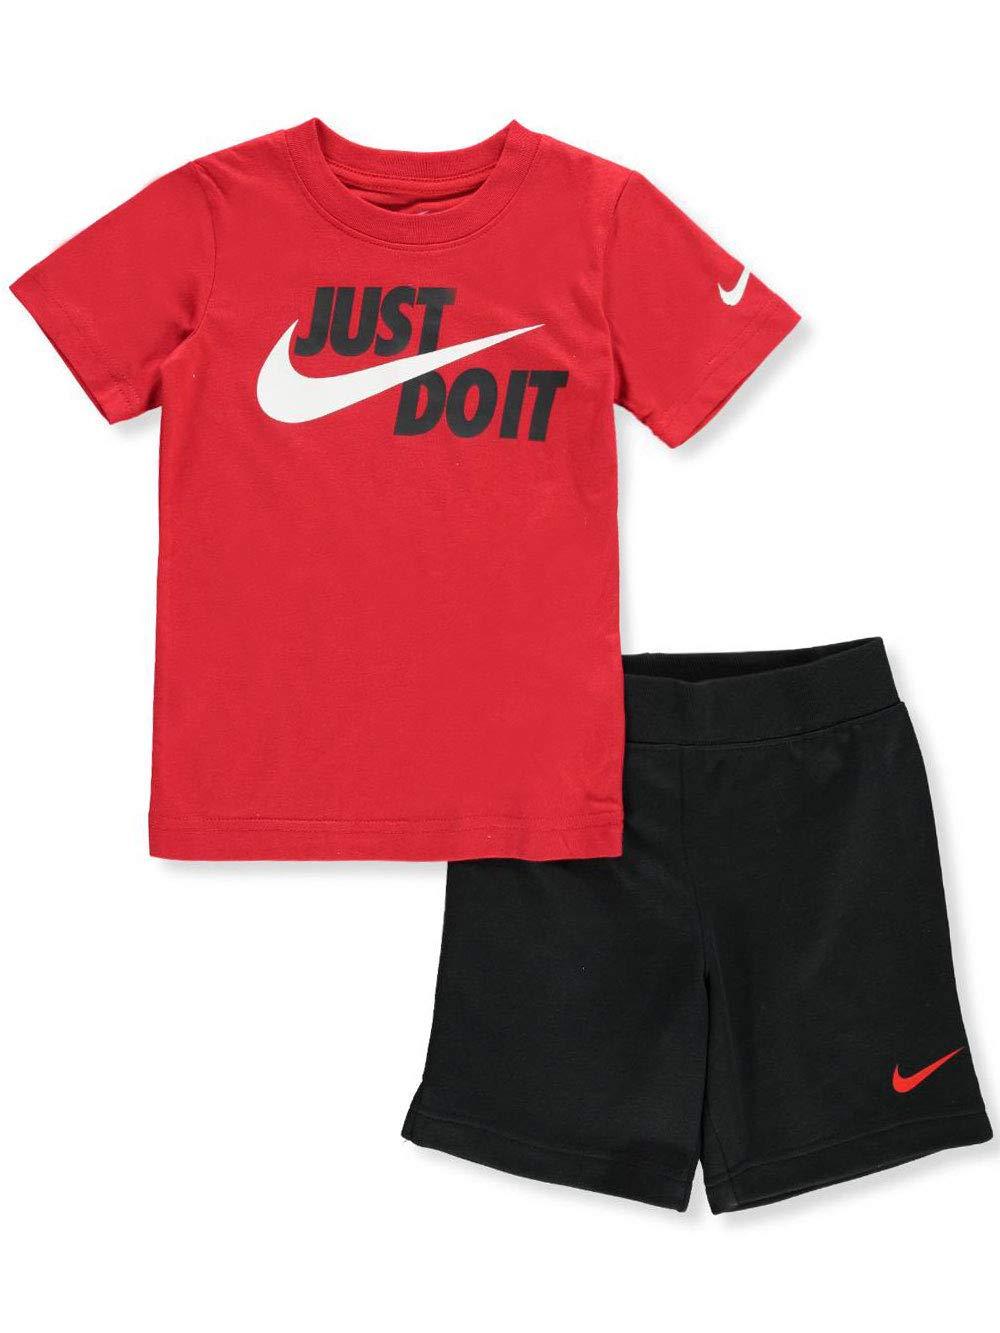 Nike Boys' 2-Piece Shorts Set Outfit - Black, 4t